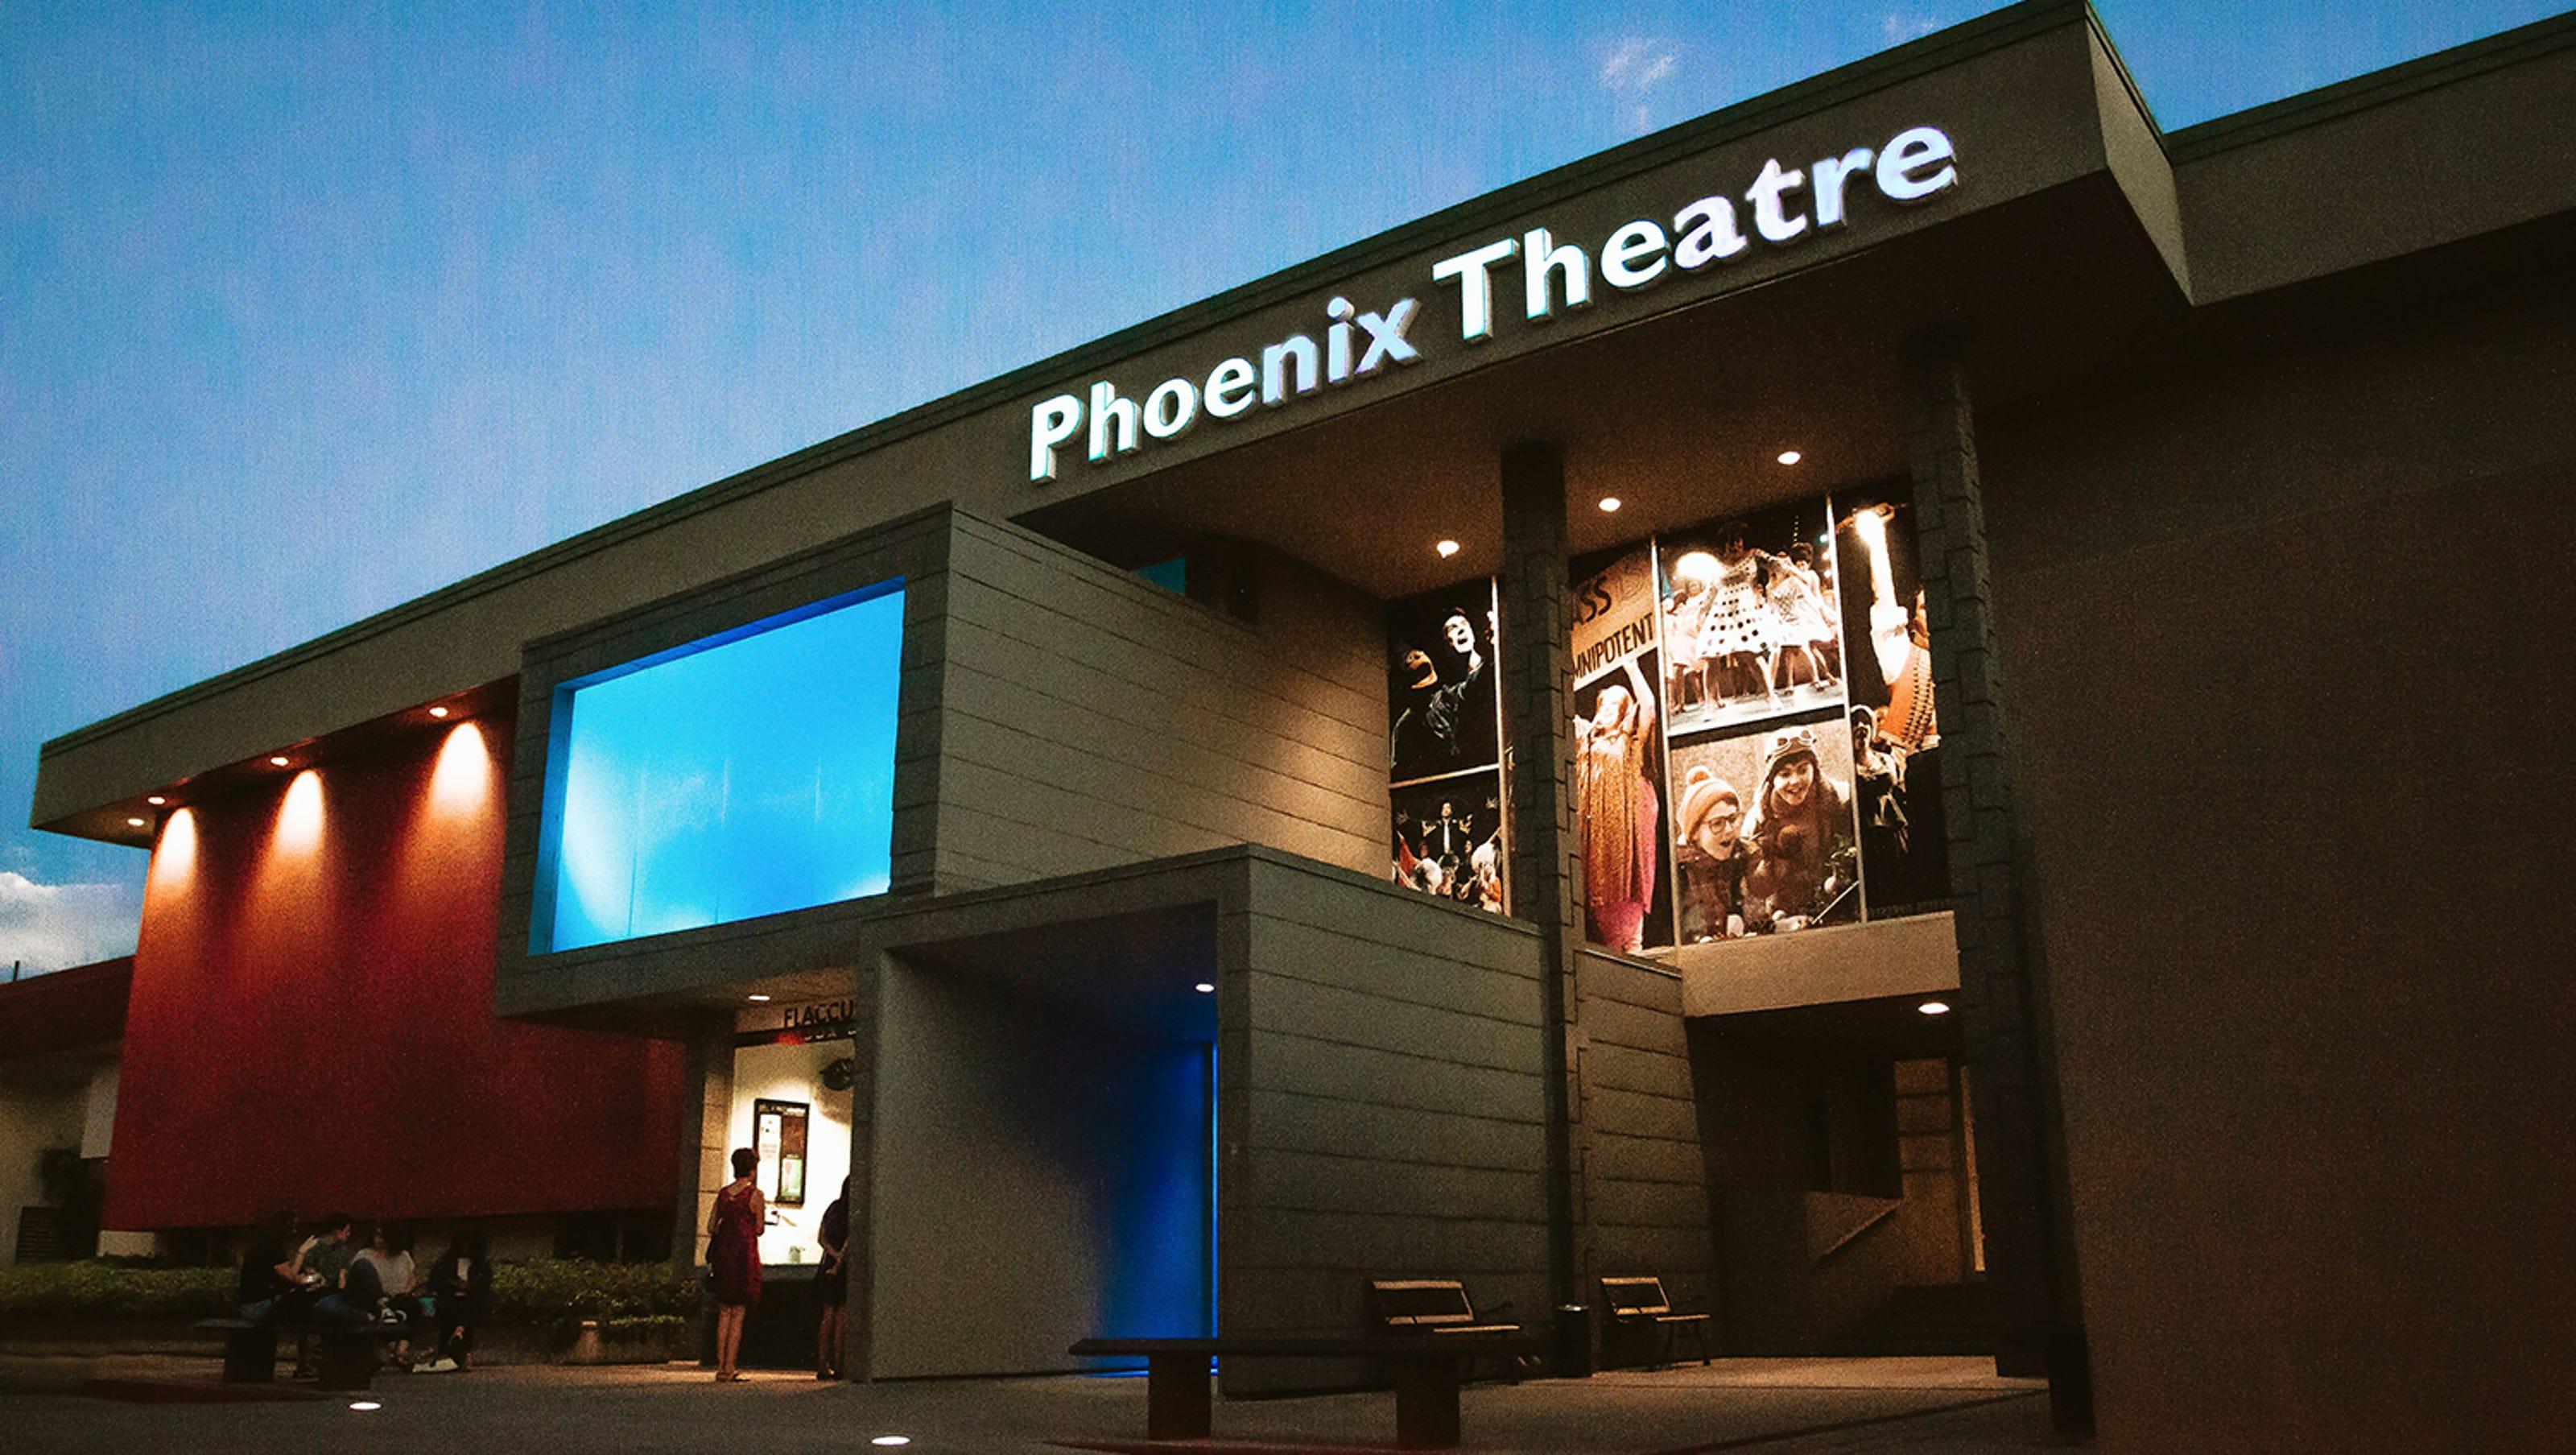 Fun Things To Do In Phoenix This Week